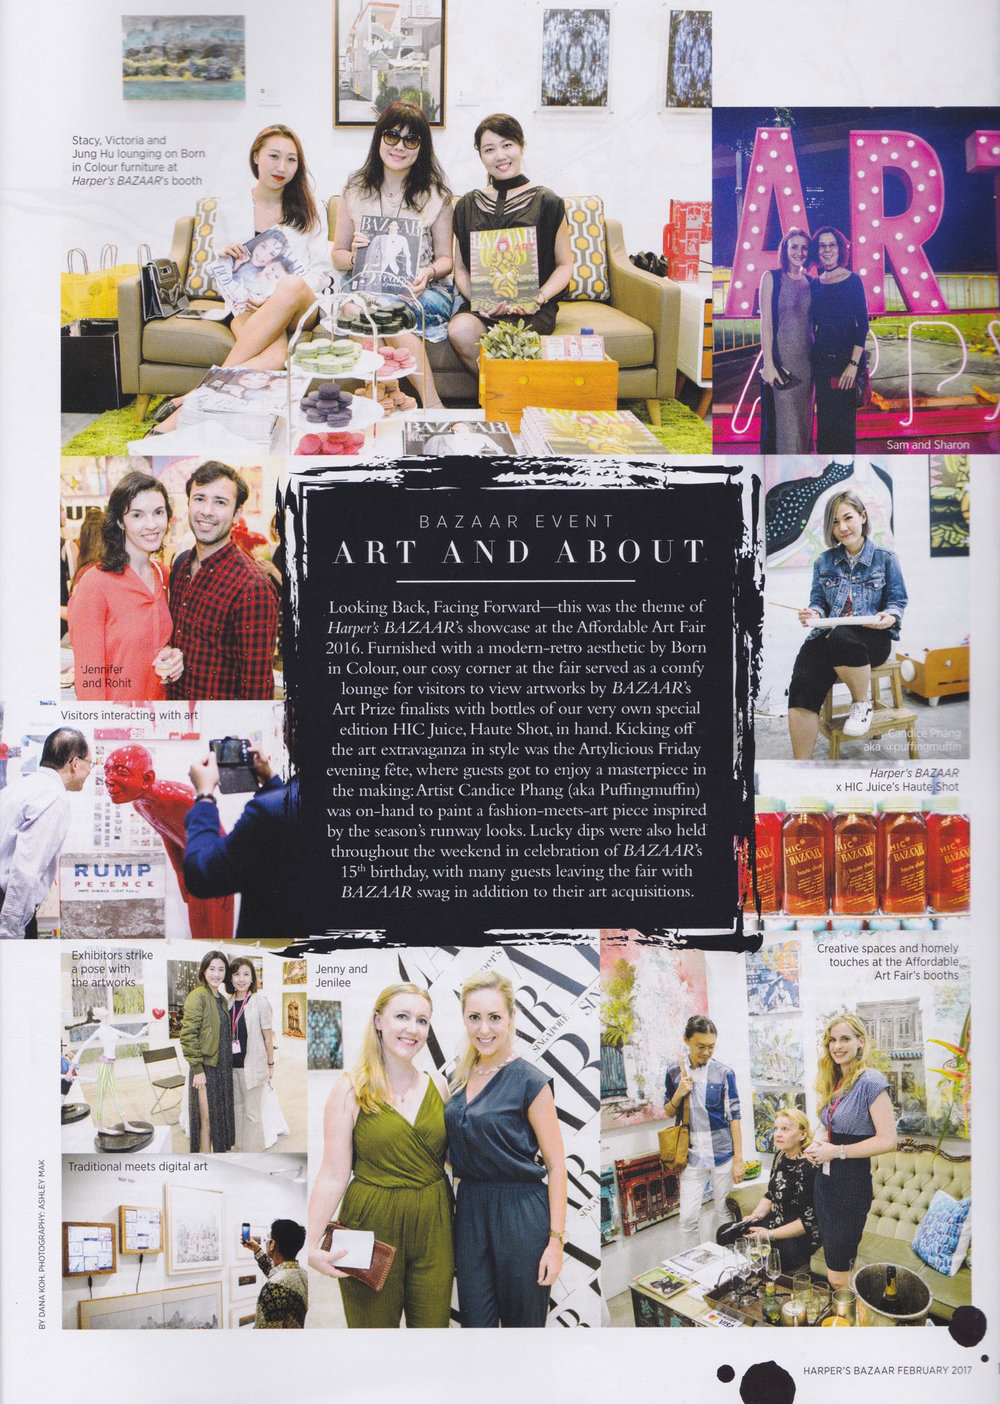 Harper's-Bazaar-Feb-2017.jpg